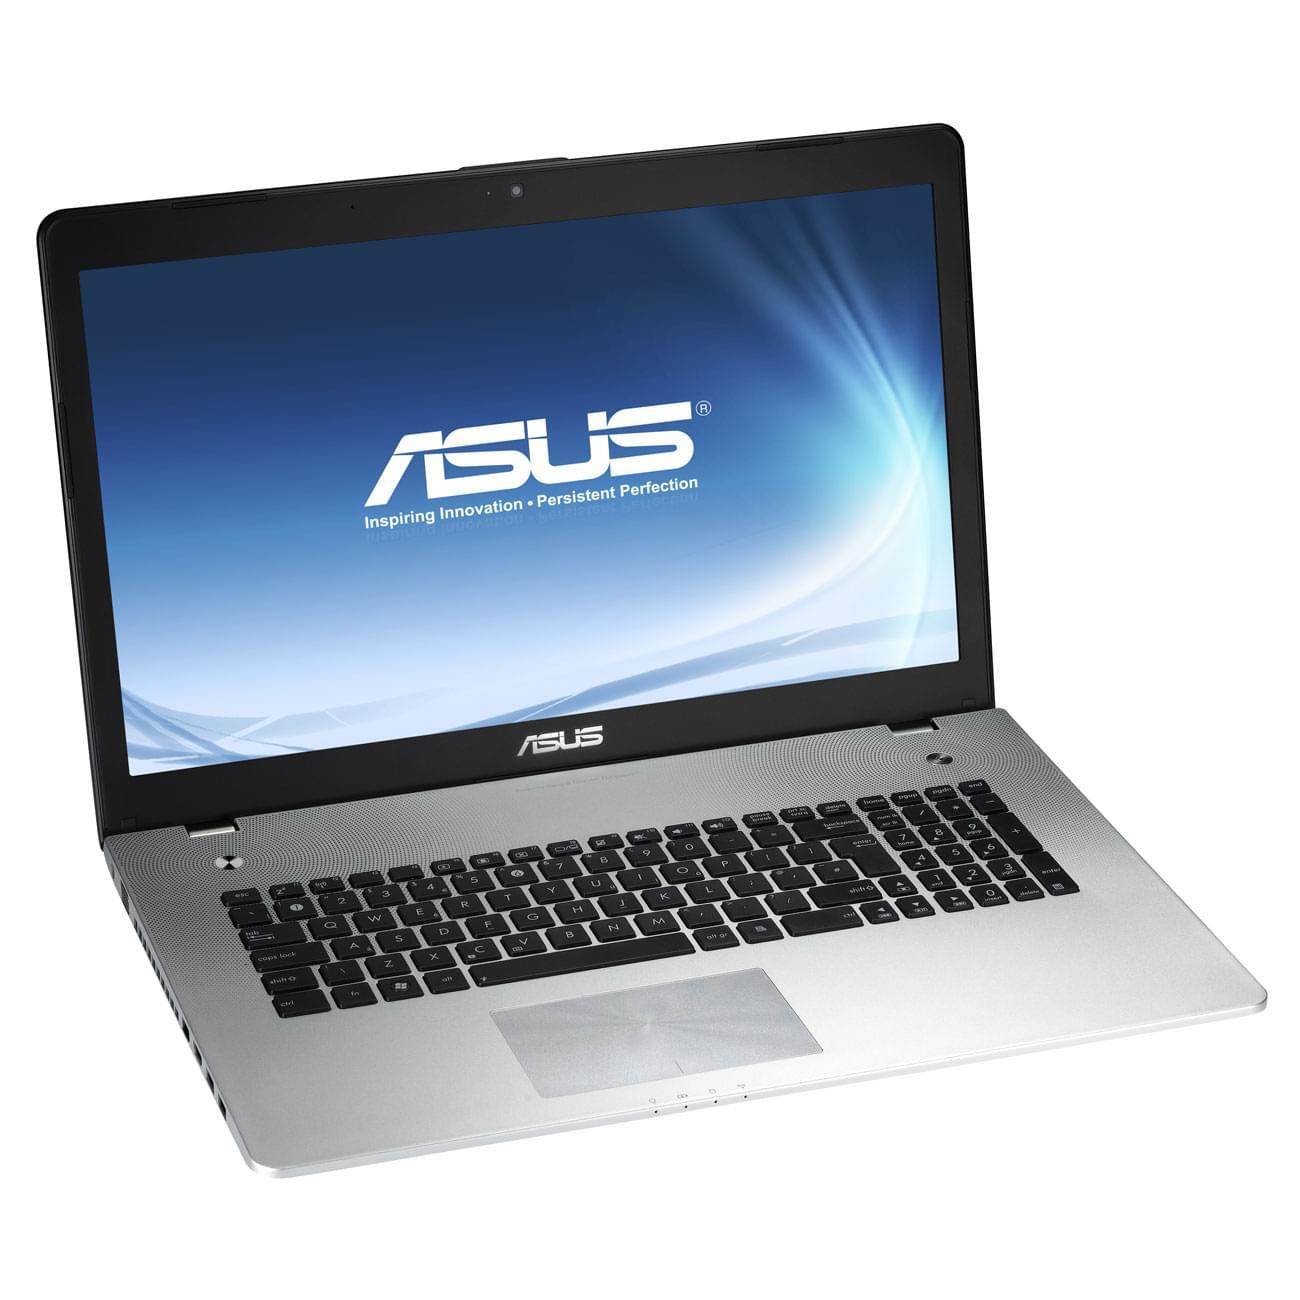 Asus N76VZ-V2G-T1002V (N76VZ-V2G-T1002V) - Achat / Vente PC Portable sur Cybertek.fr - 0